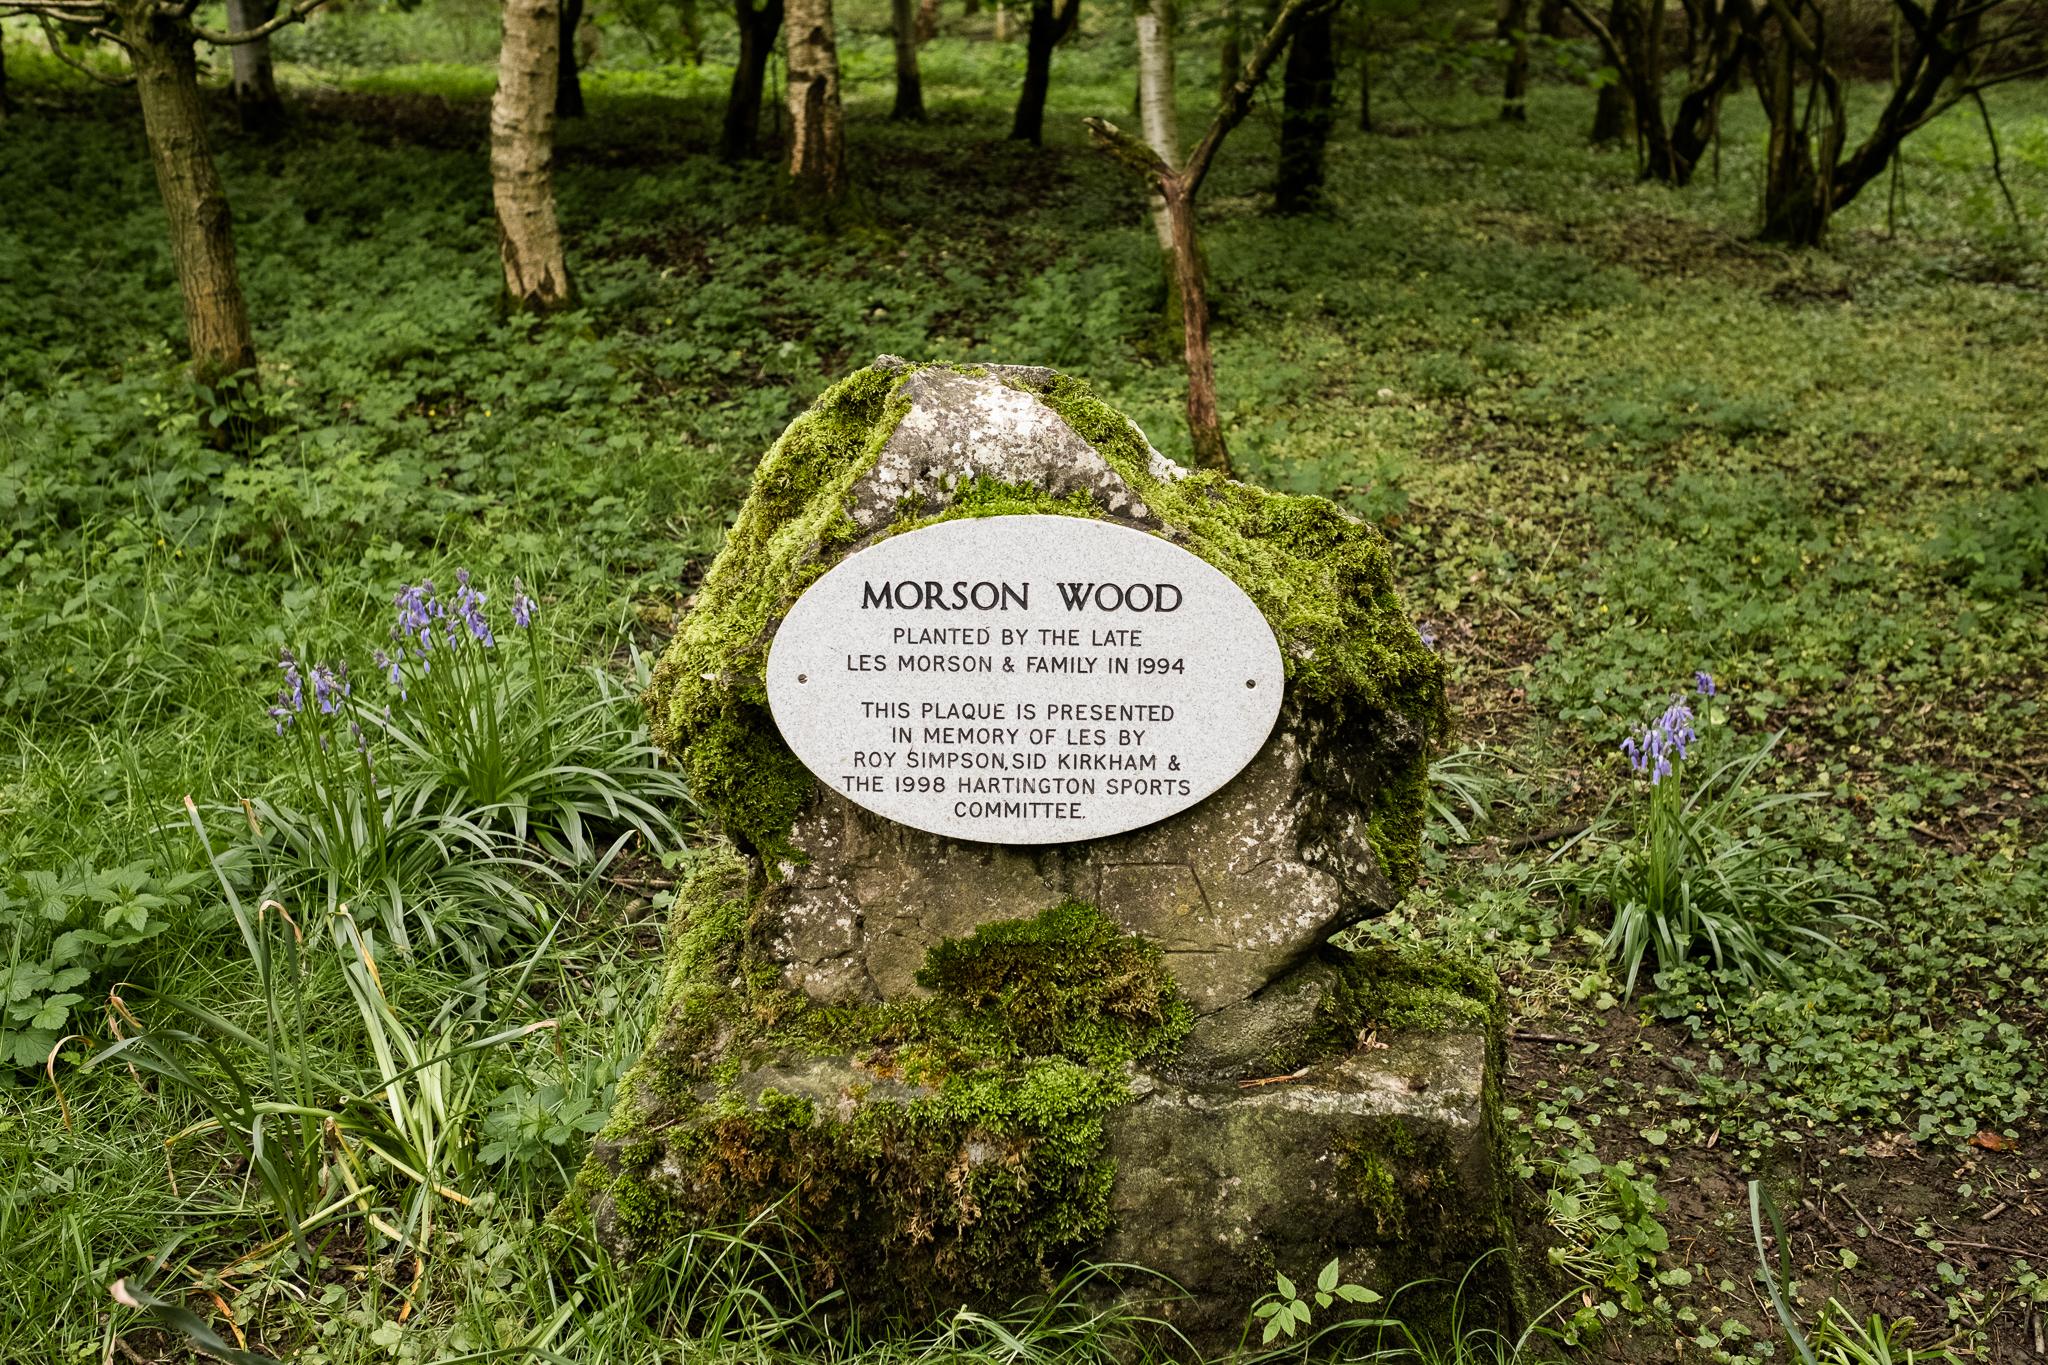 05.19.2017 The Photowalk Network Get Some Fresh Air Photowalk at Hartington and Biggin, Staffordshire Peak District National Trust-7.jpg